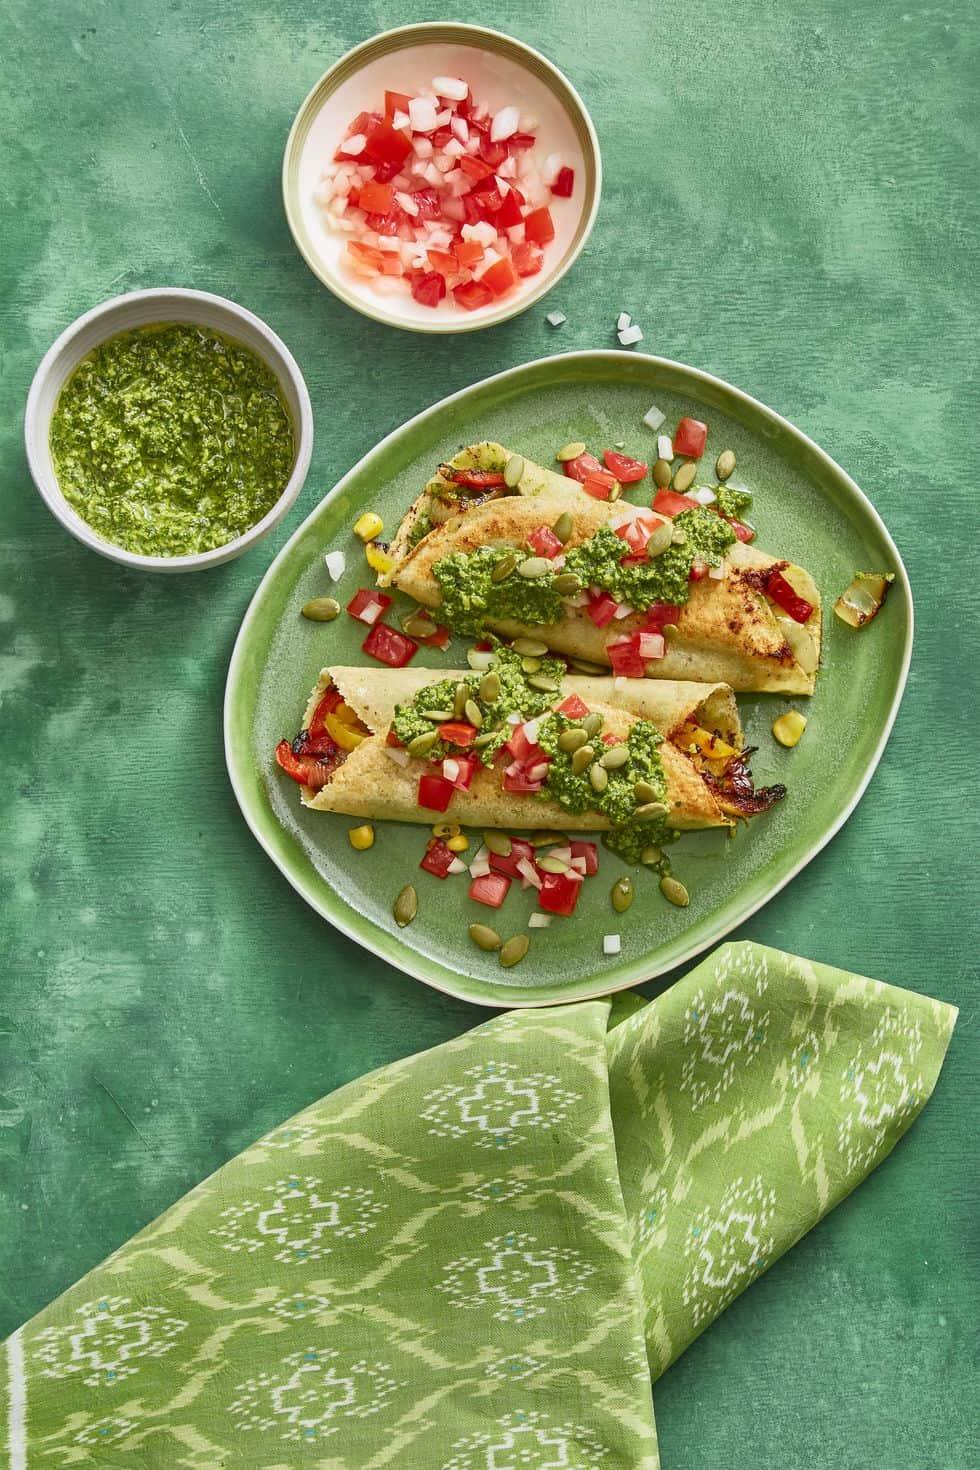 Enchiladas with pumpkin seed salsa